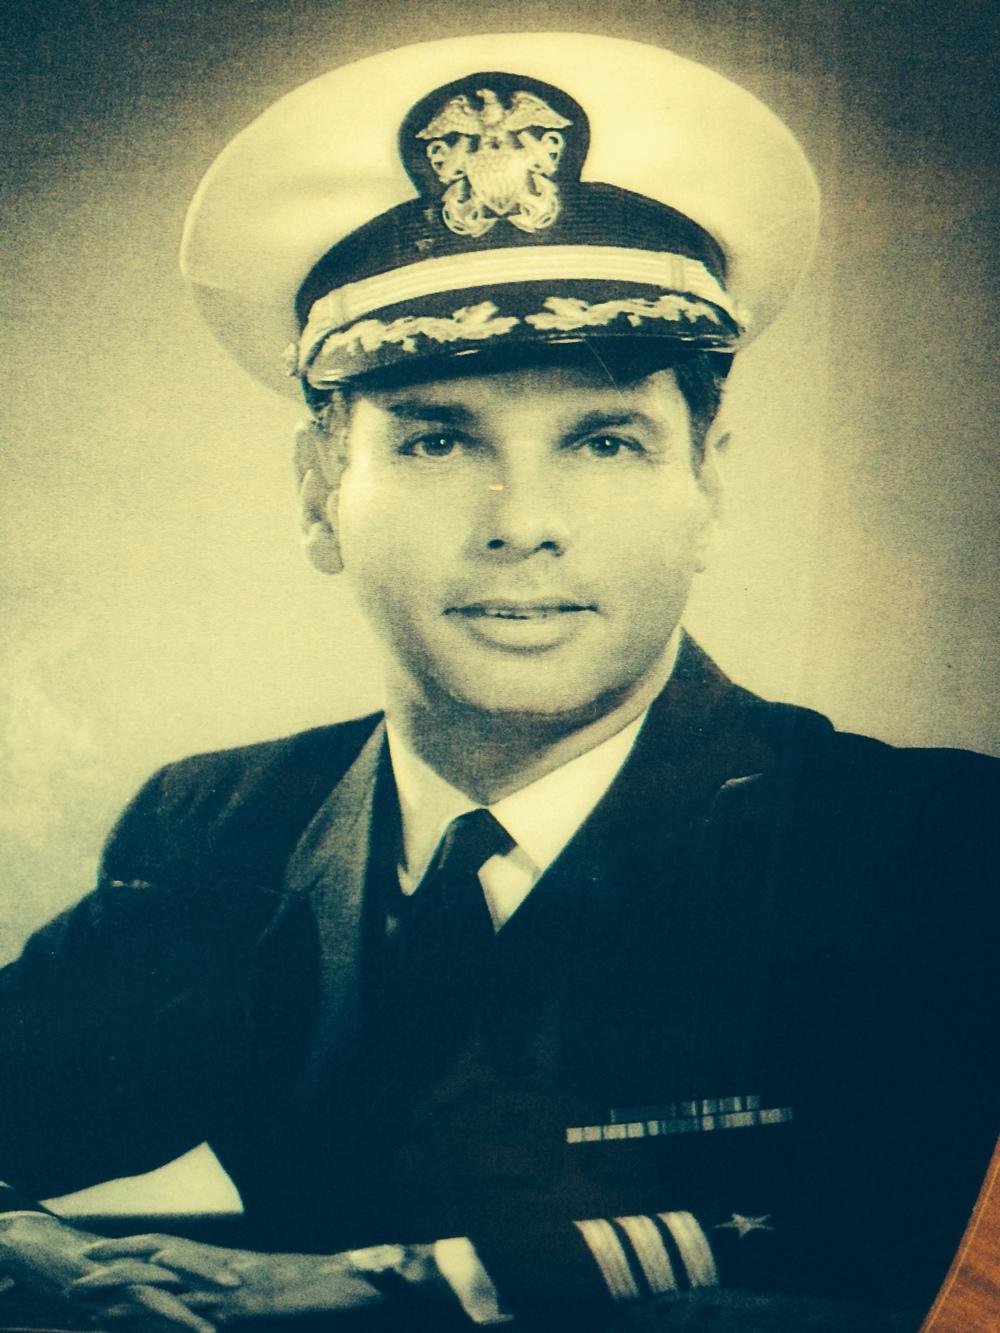 Ellis S. Rubin_Navy.JPG